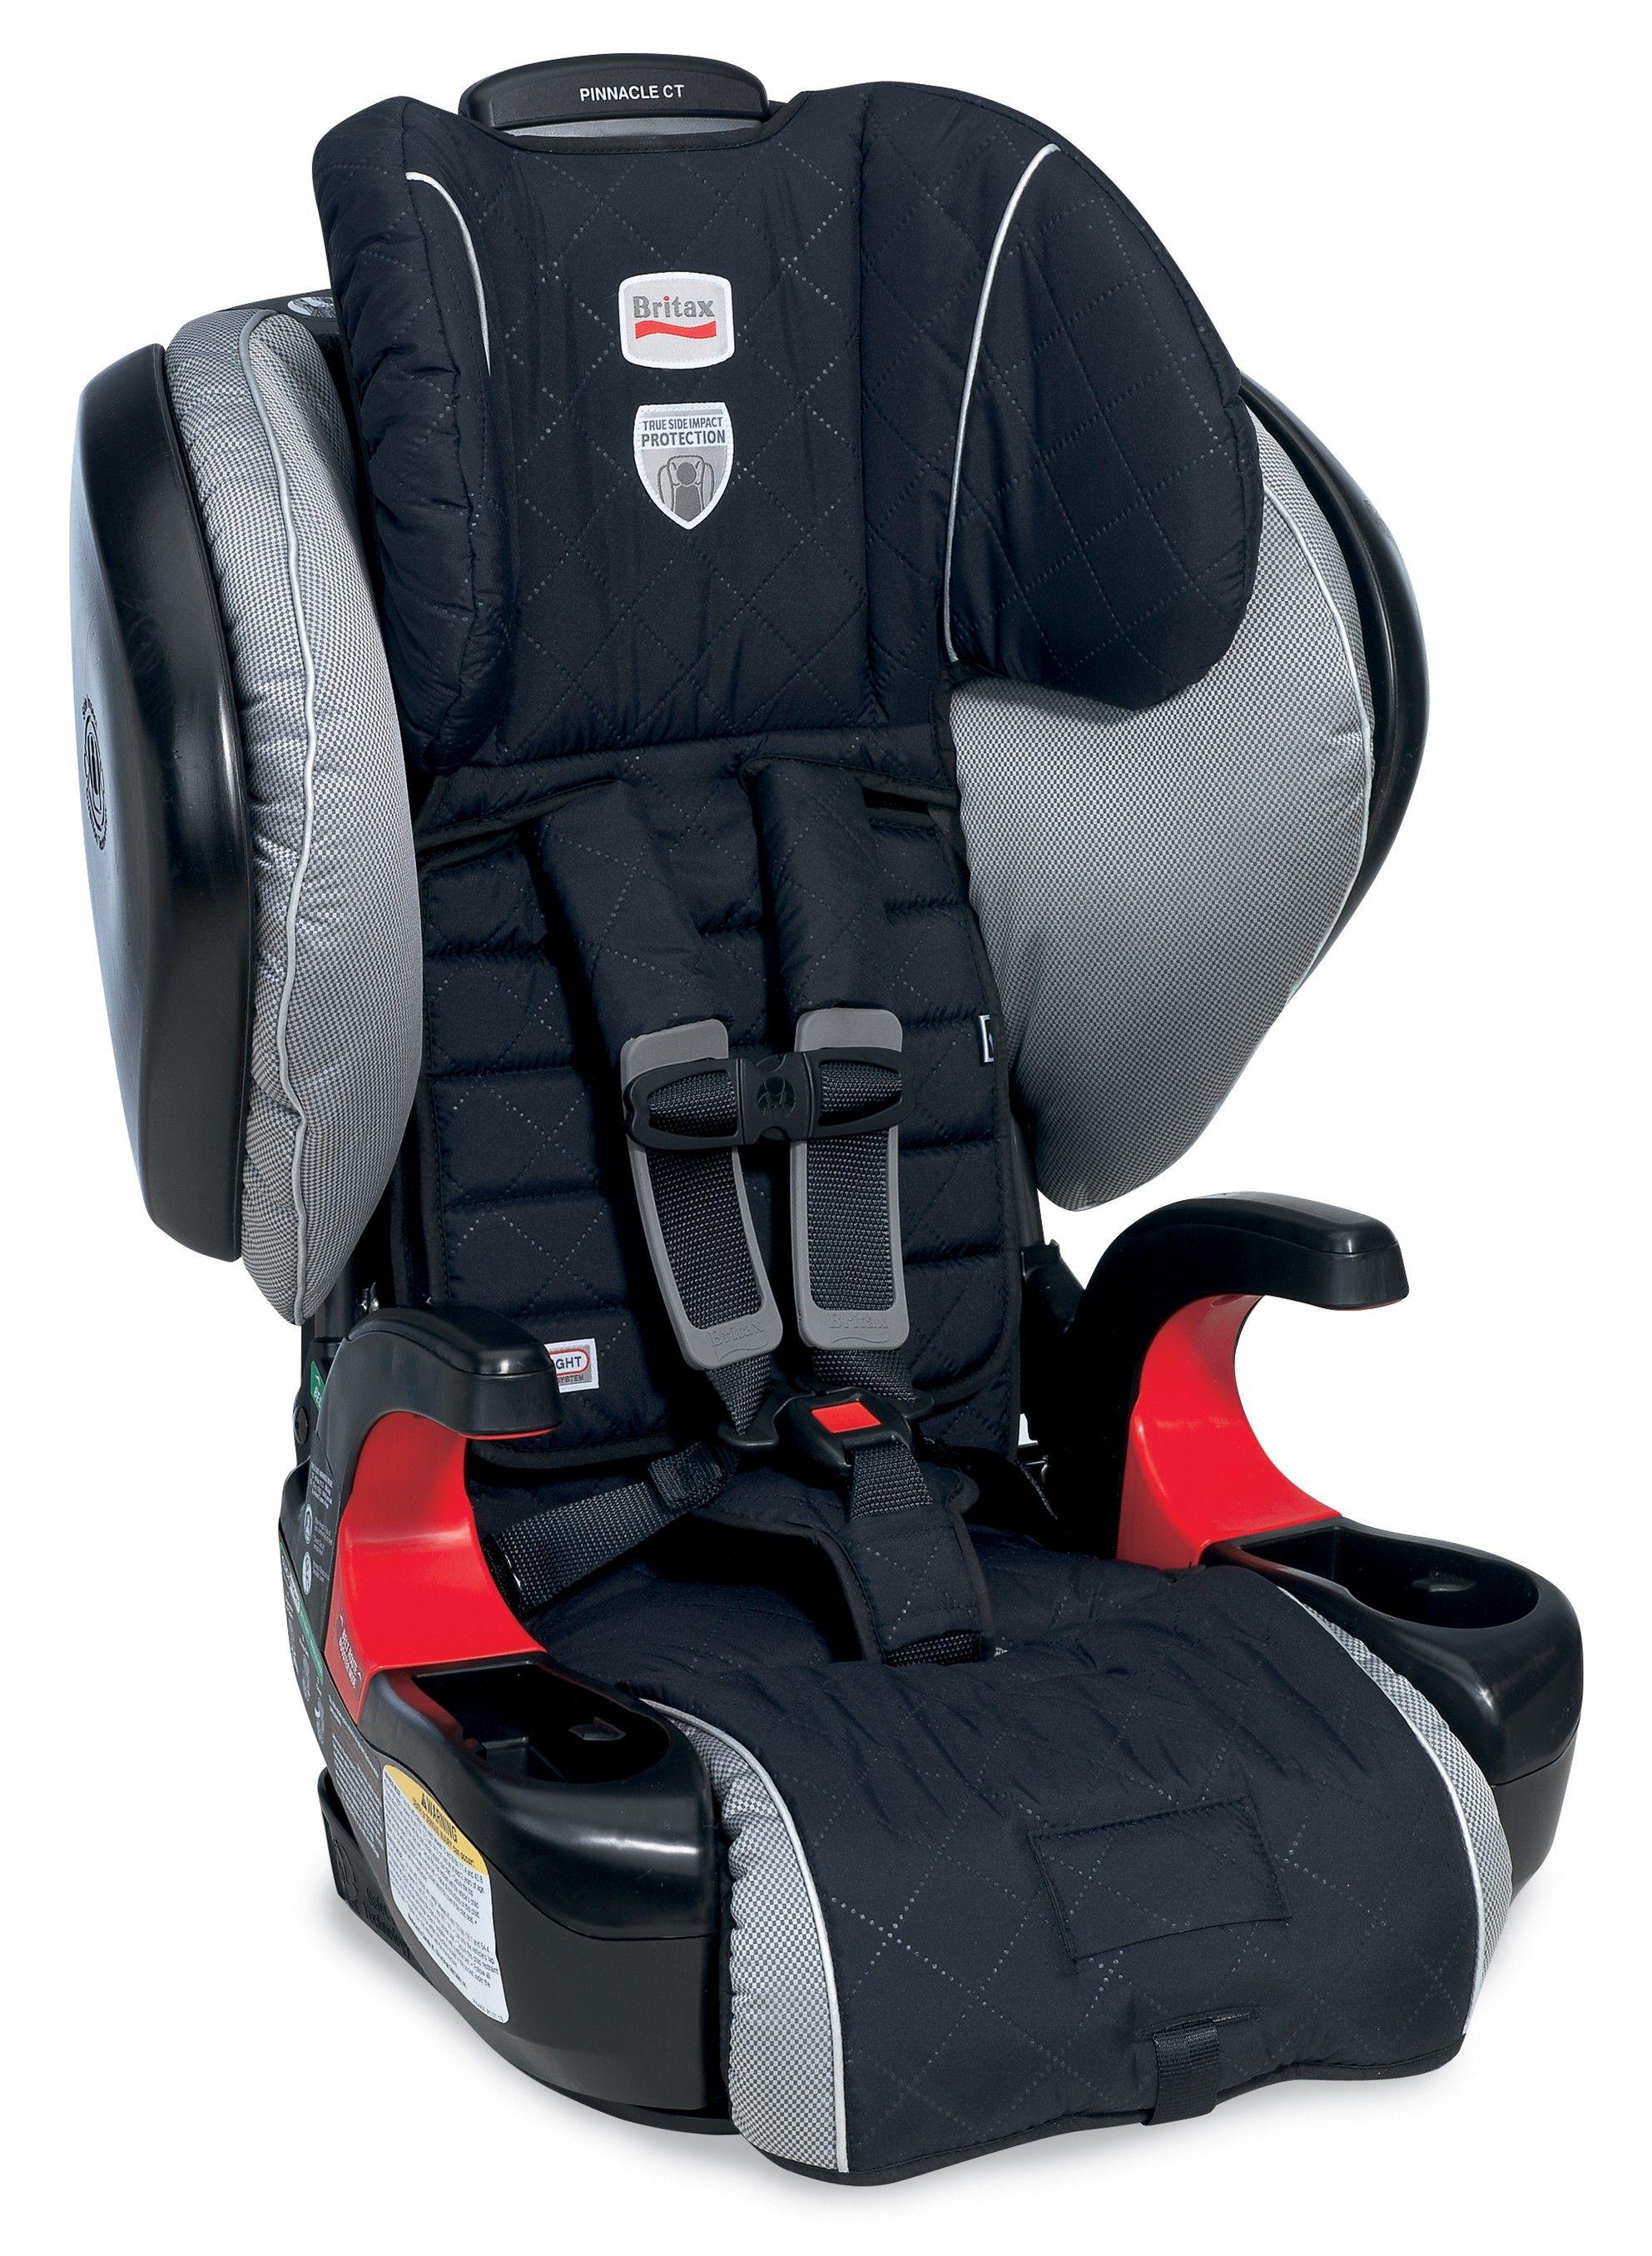 Britax Pinnacle CT Manhatten Booster car seat, Britax